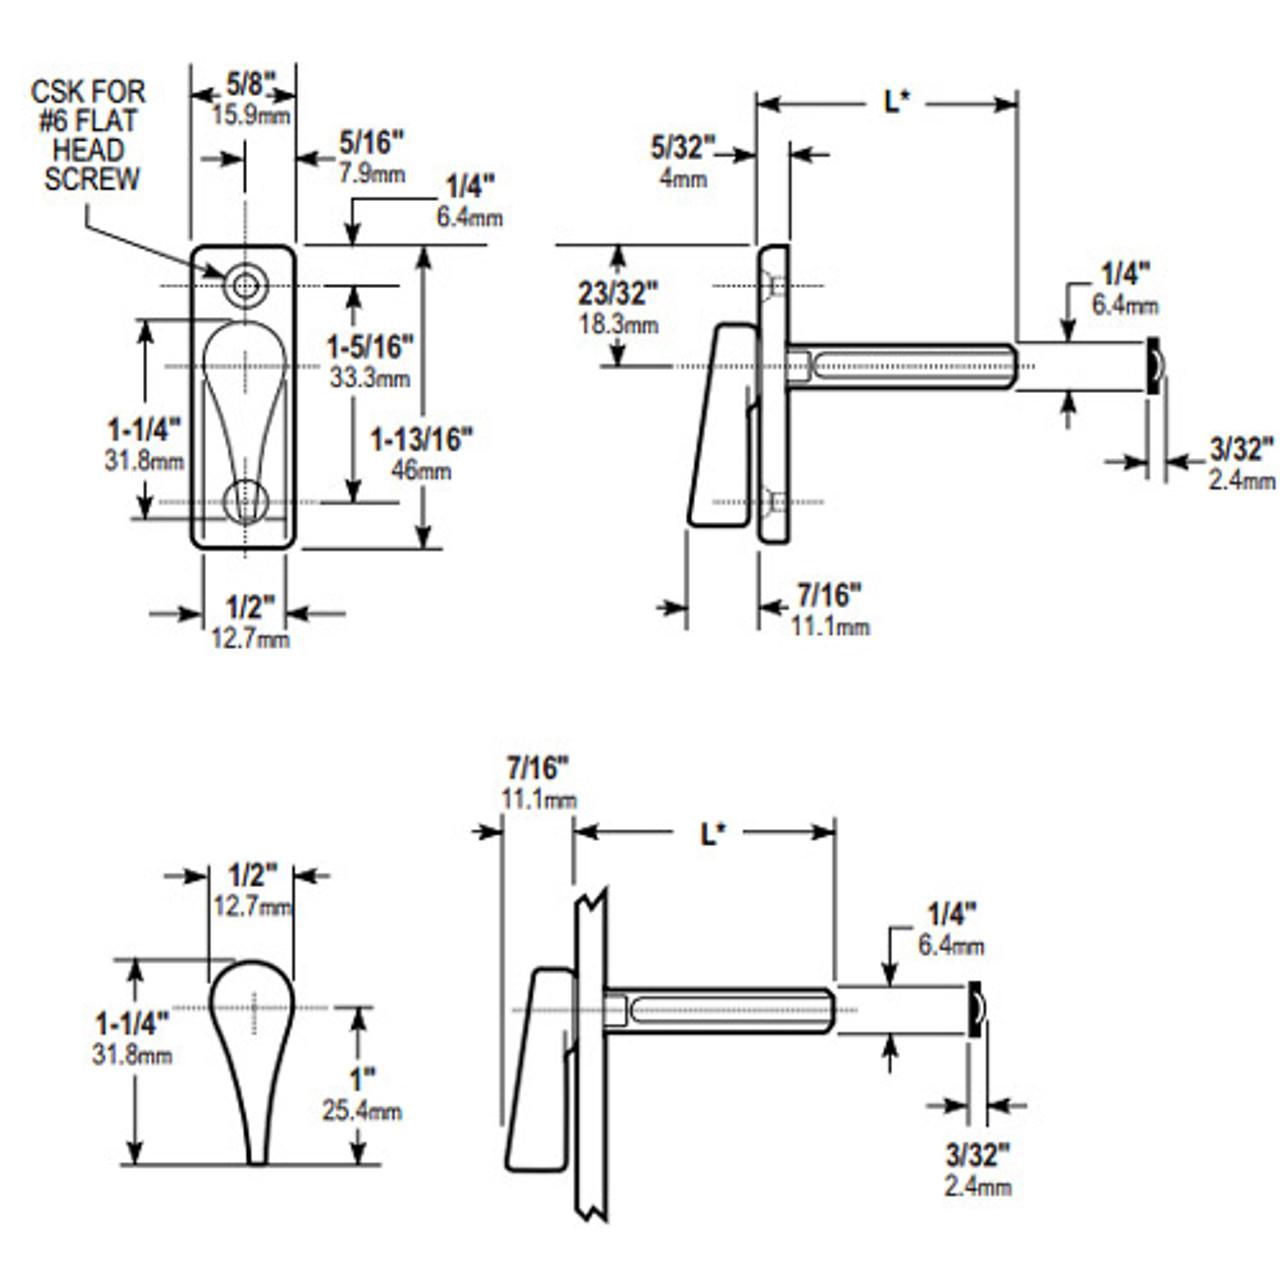 1000-21-20-130 Adams Rite 1000 Series Turns Dimensional View